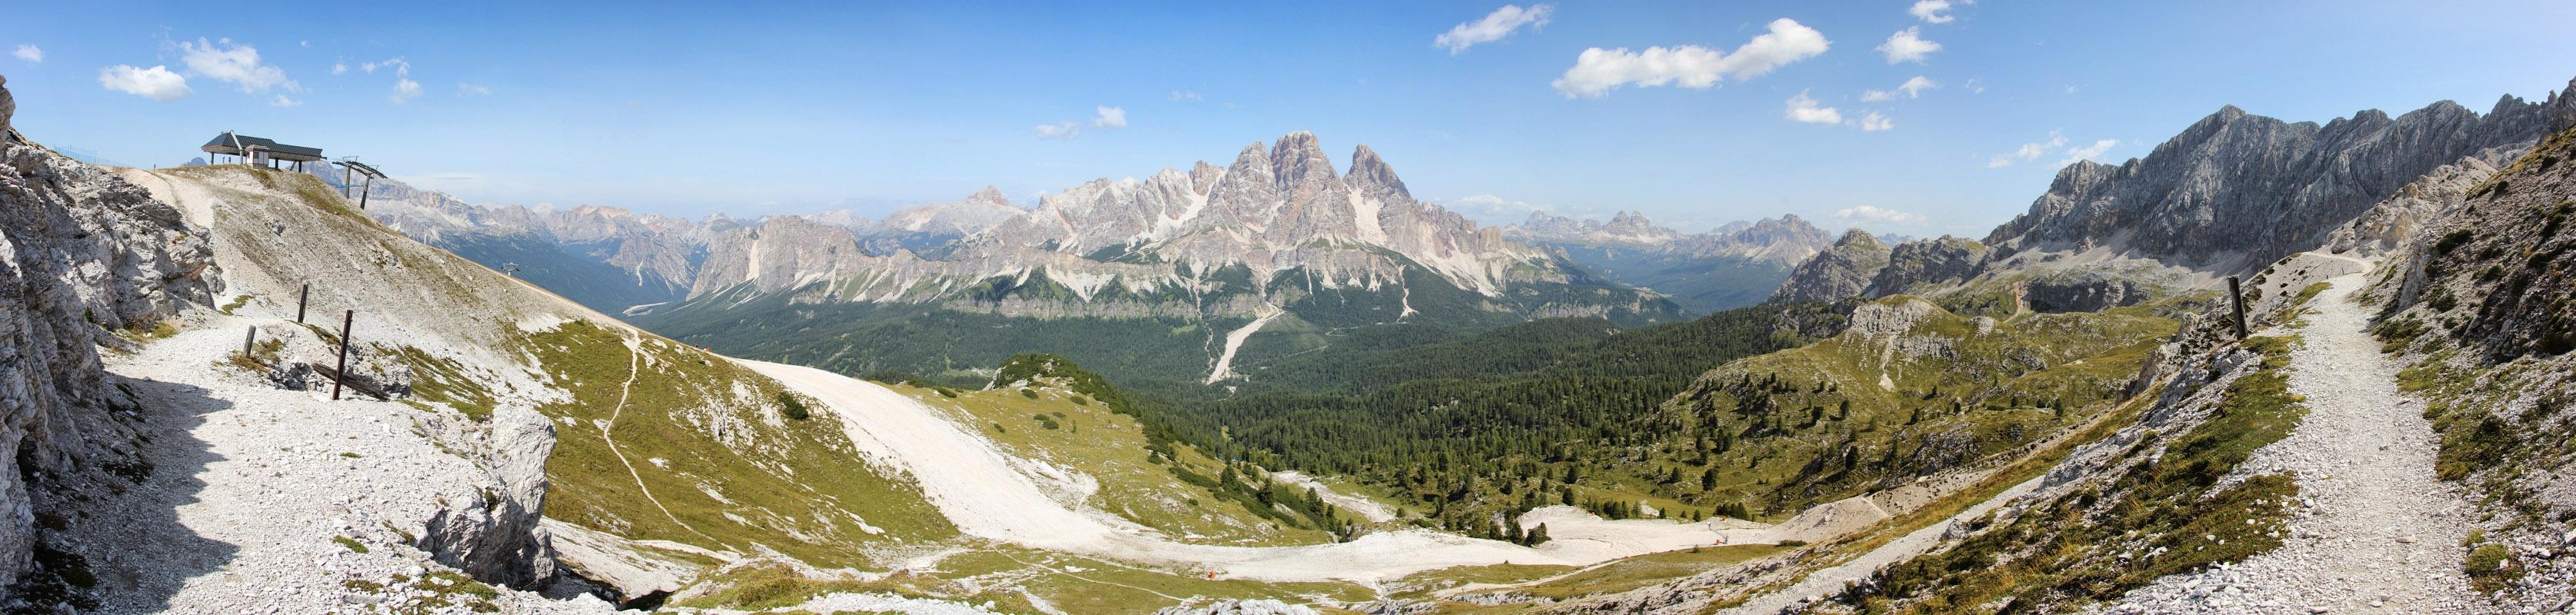 Panoráma Monte Cristallo z Tondi di Faloria, v pozadí Tre Cime